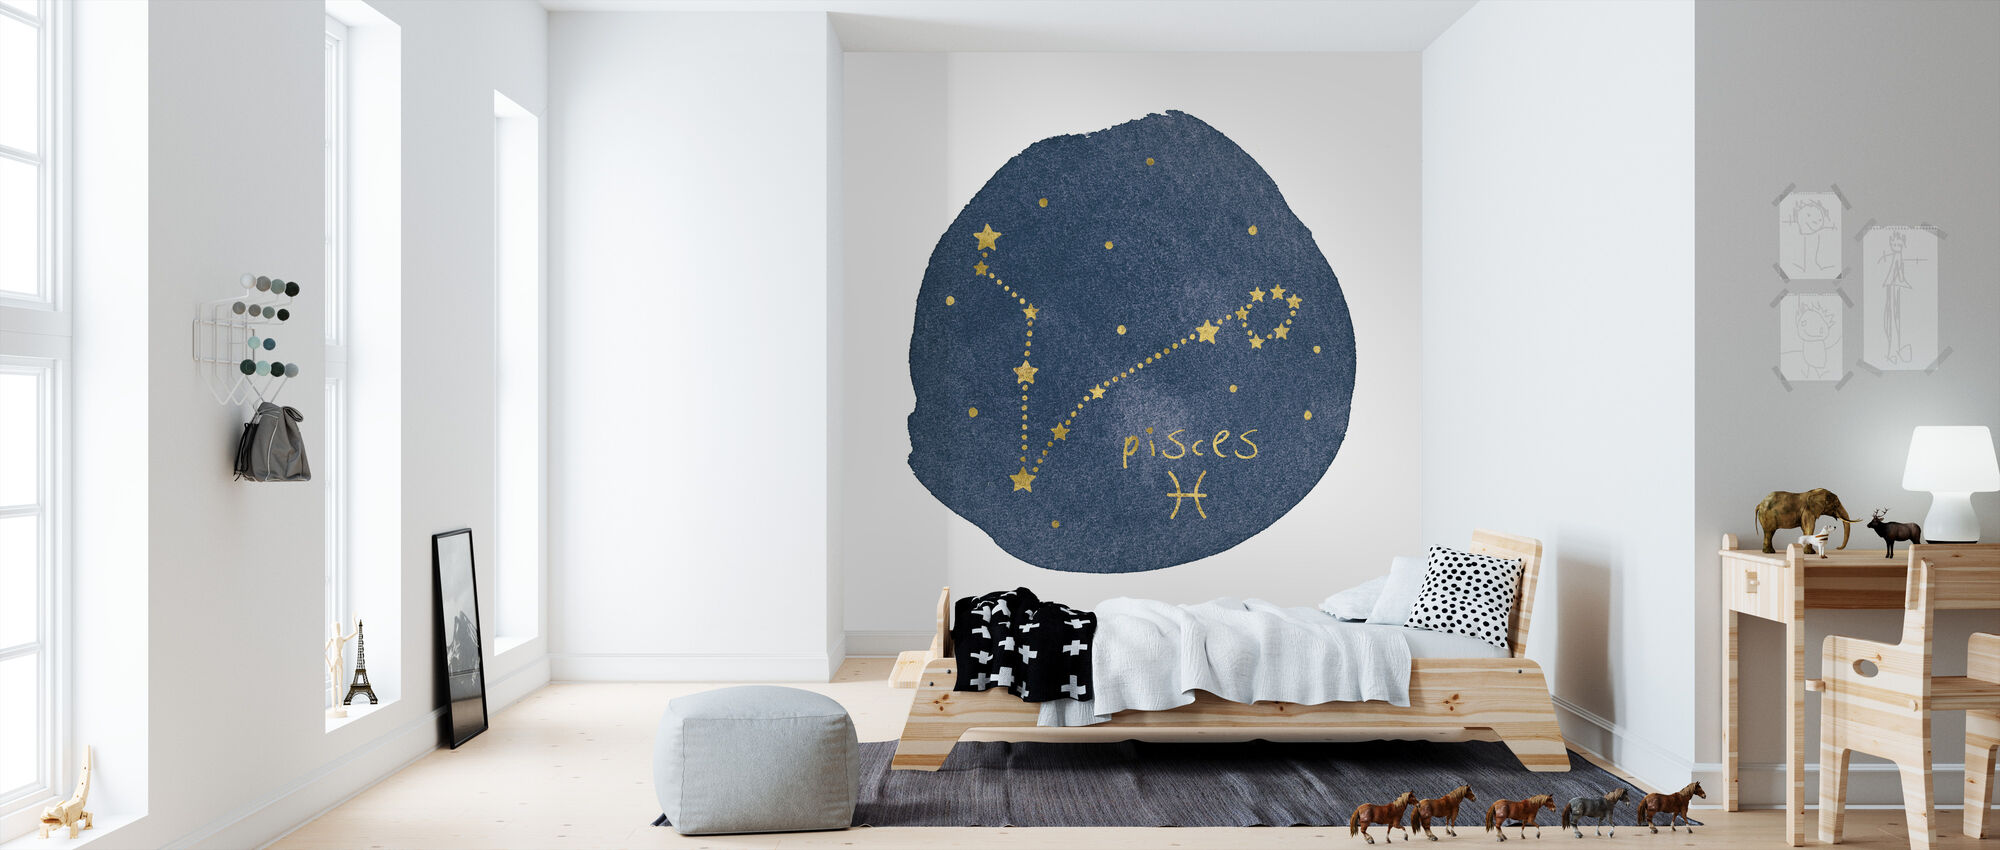 Horoskop Fiskarna - Tapet - Barnrum